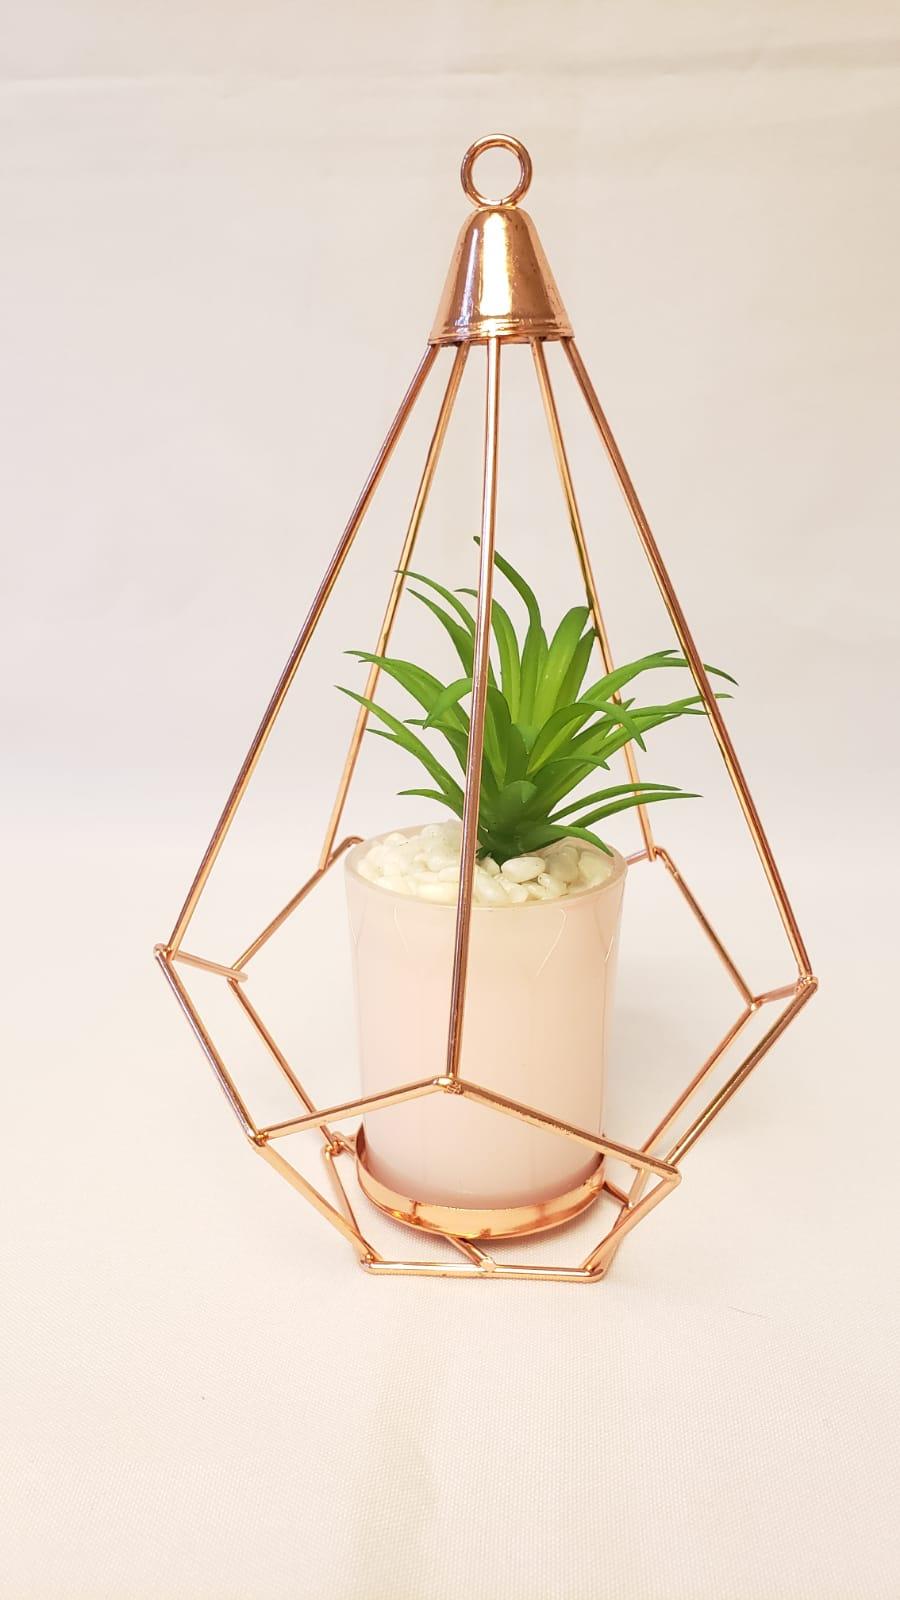 Vaso pendente pirâmide com planta